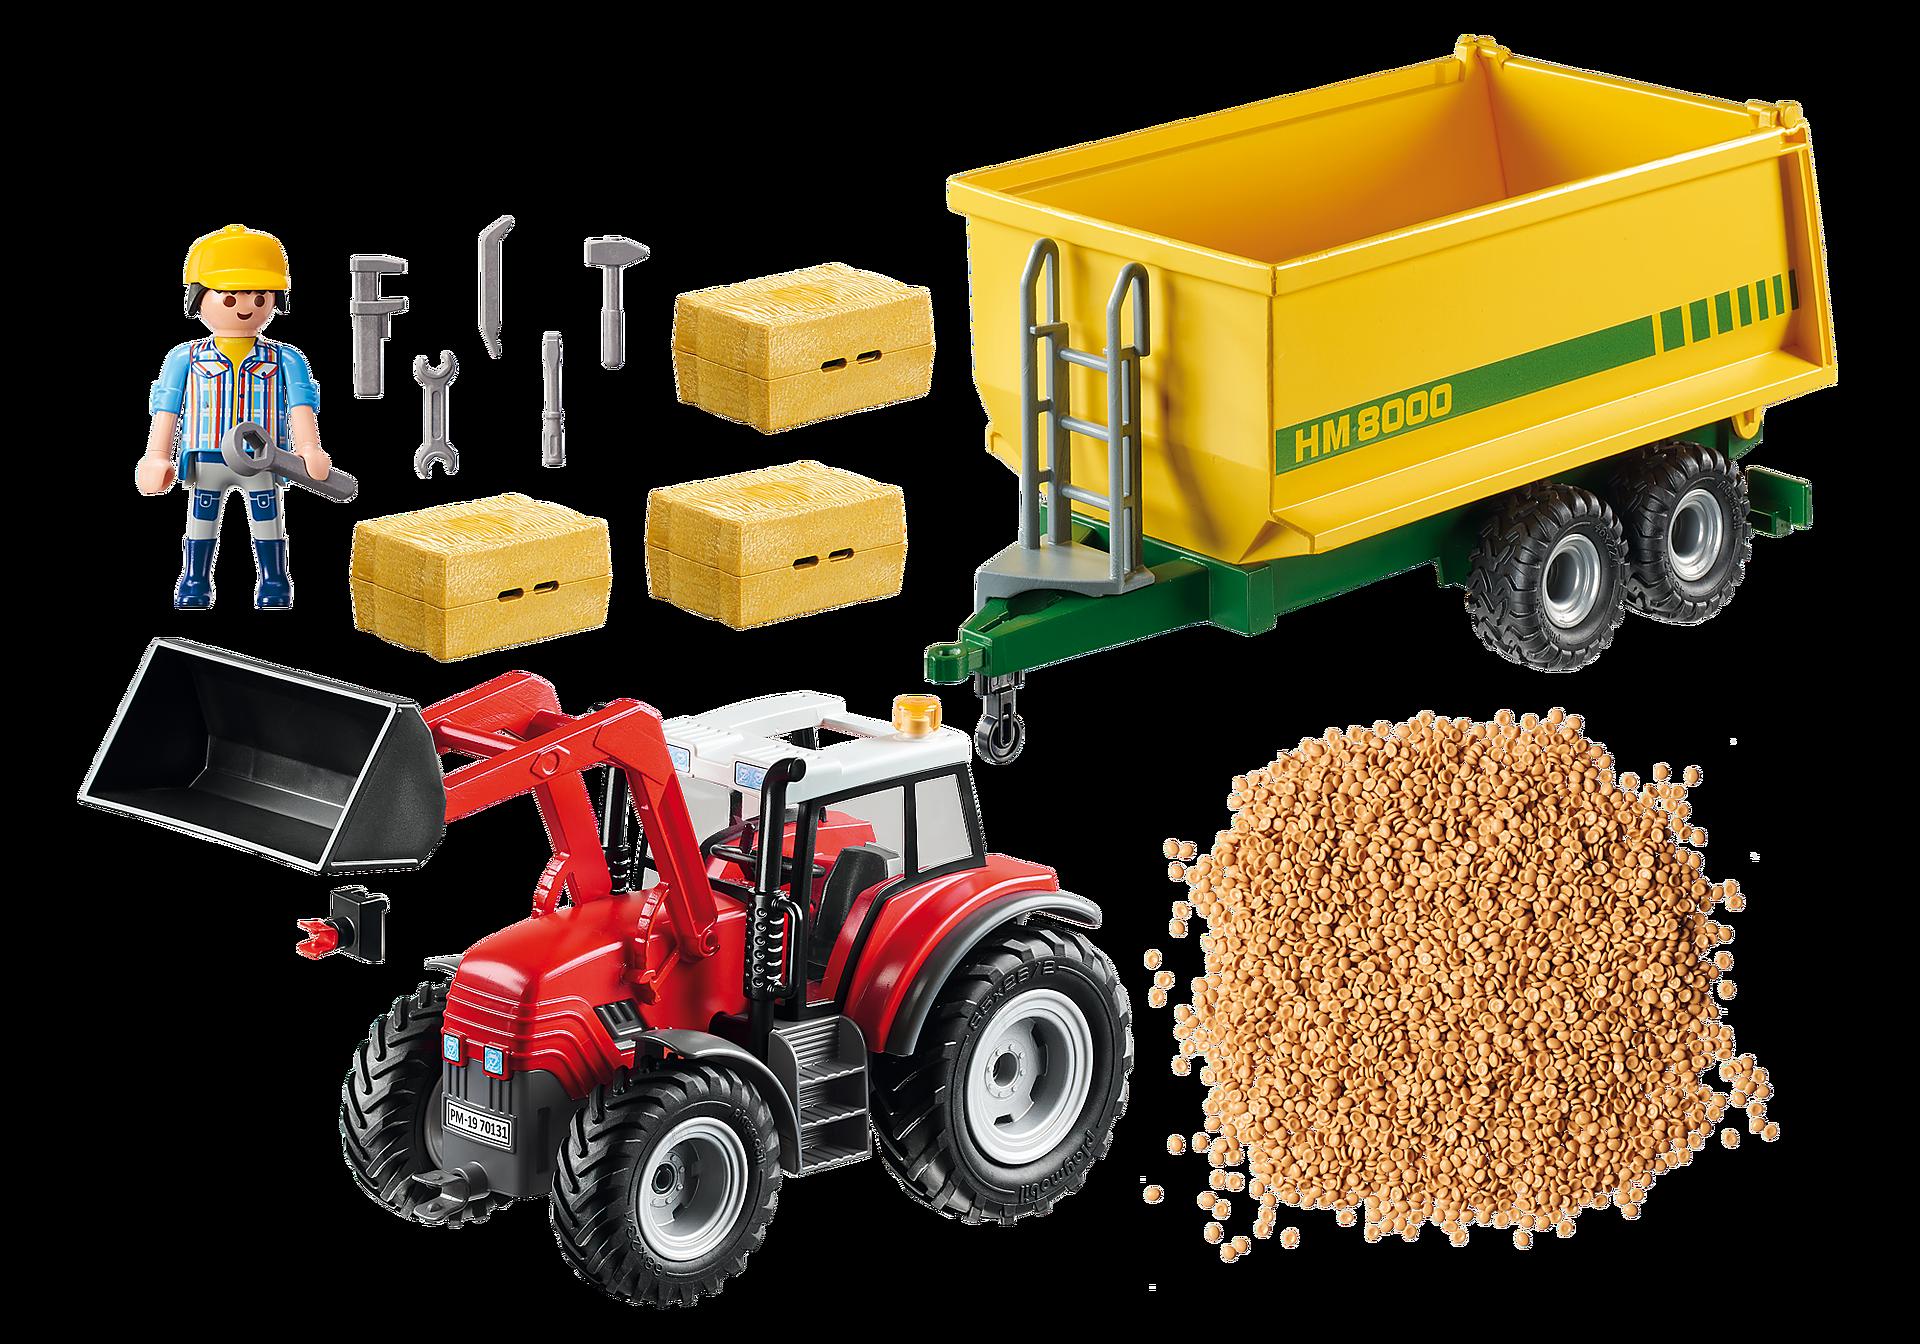 70131 Grand tracteur avec remorque zoom image3